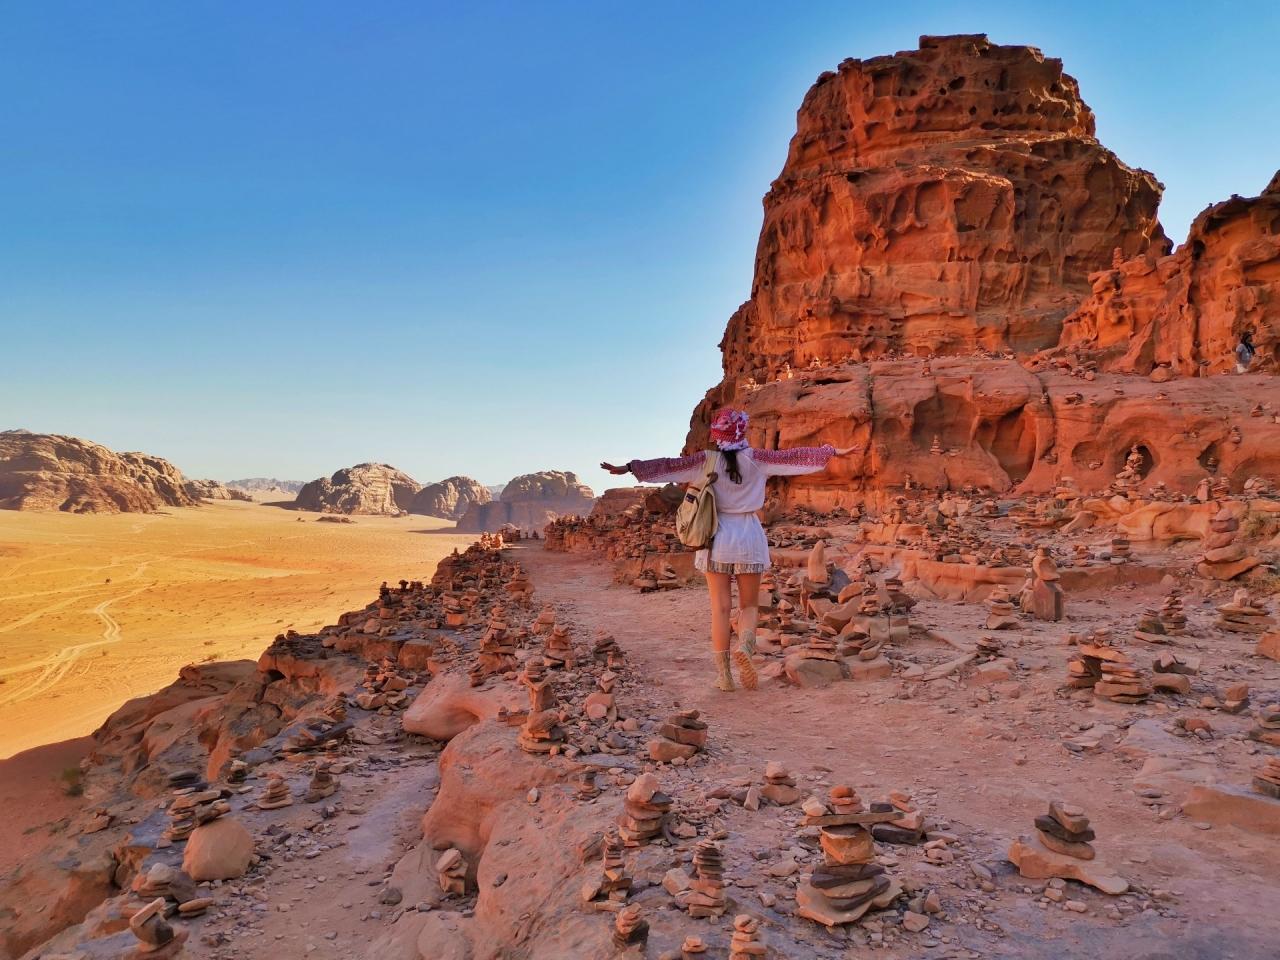 Andreea pe stanci Wadi Rum 2019